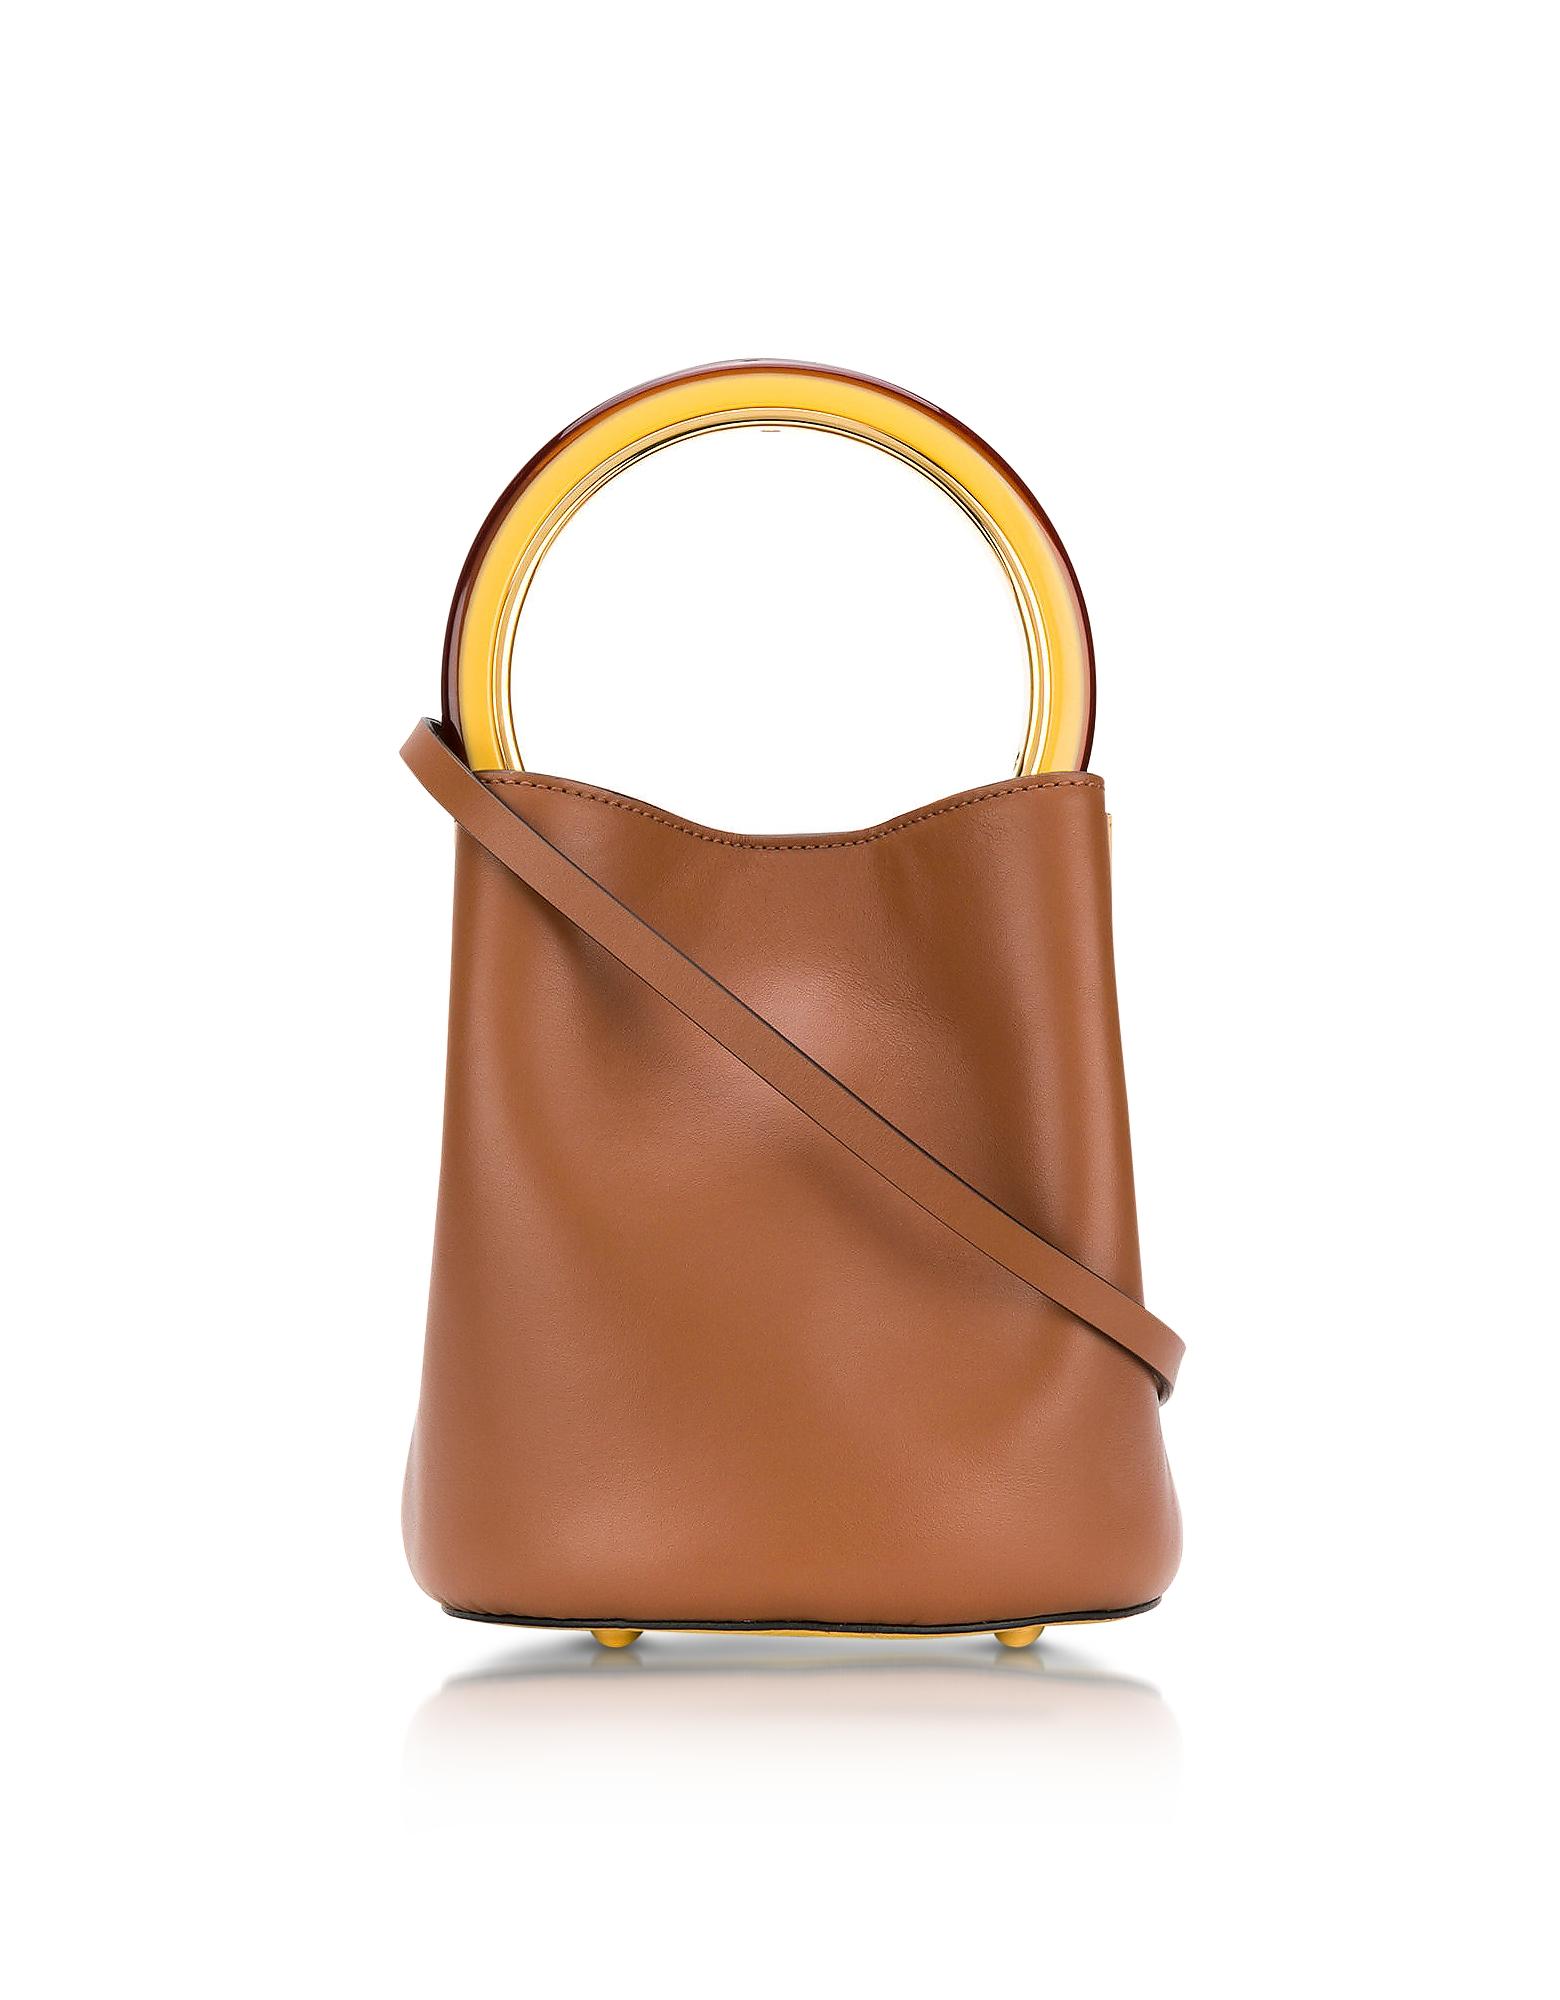 Marni Handbags, Maroon and Dark Lemon Leather Pannier Bucket Bag